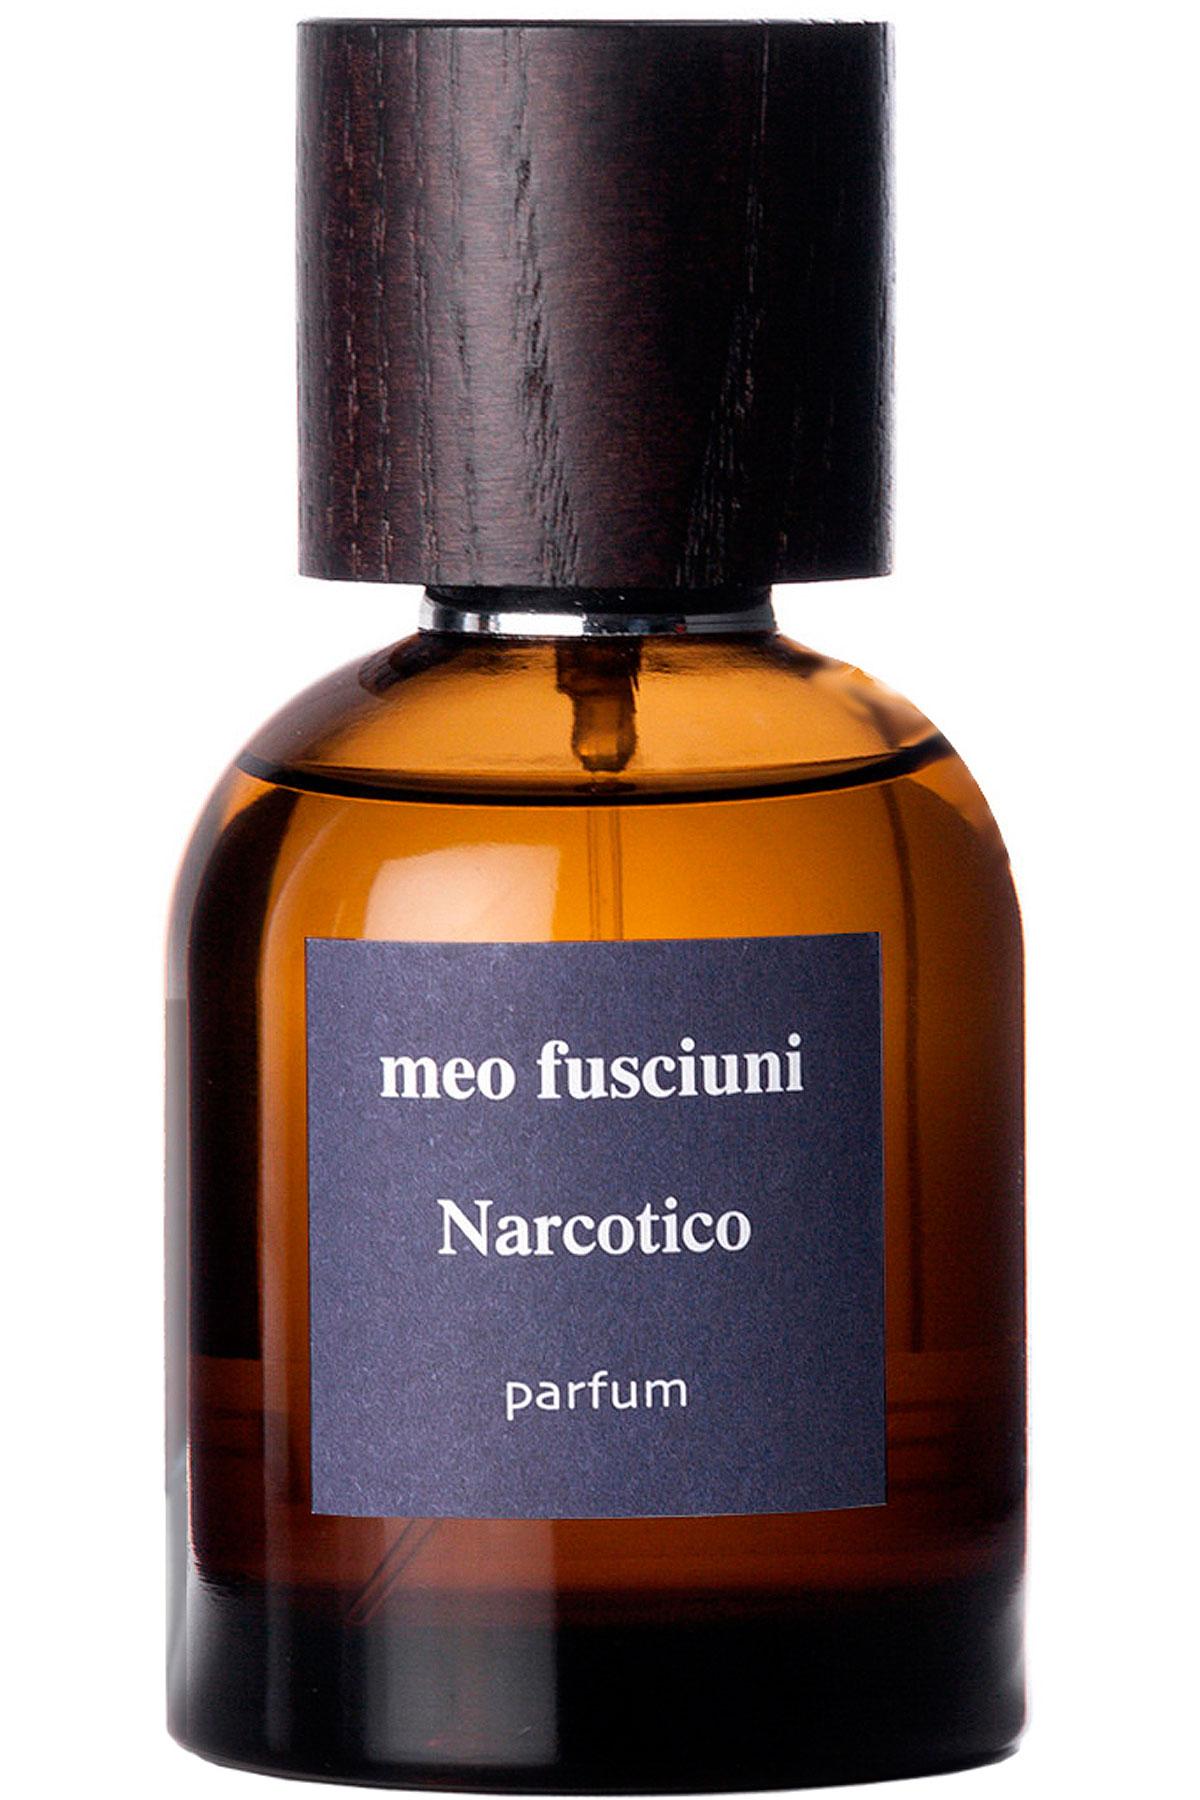 Meo Fusciuni Fragrances for Women, Narcotico - Eau De Parfum - 100 Ml, 2019, 100 ml